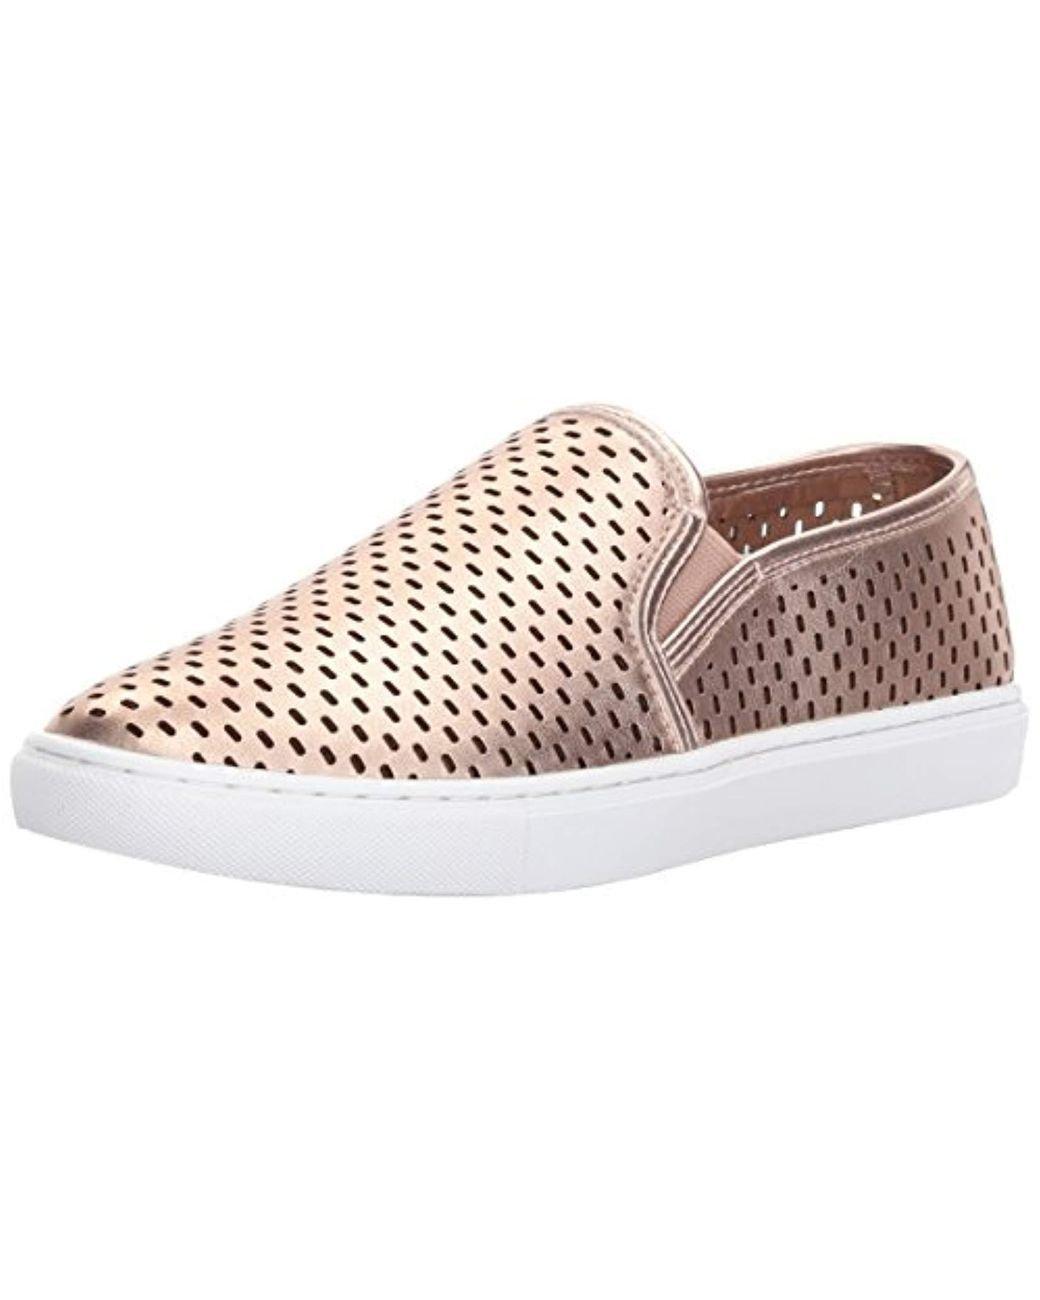 88d7247dd7d Lyst - Steve Madden Elouise Fashion Sneaker - Save 31%